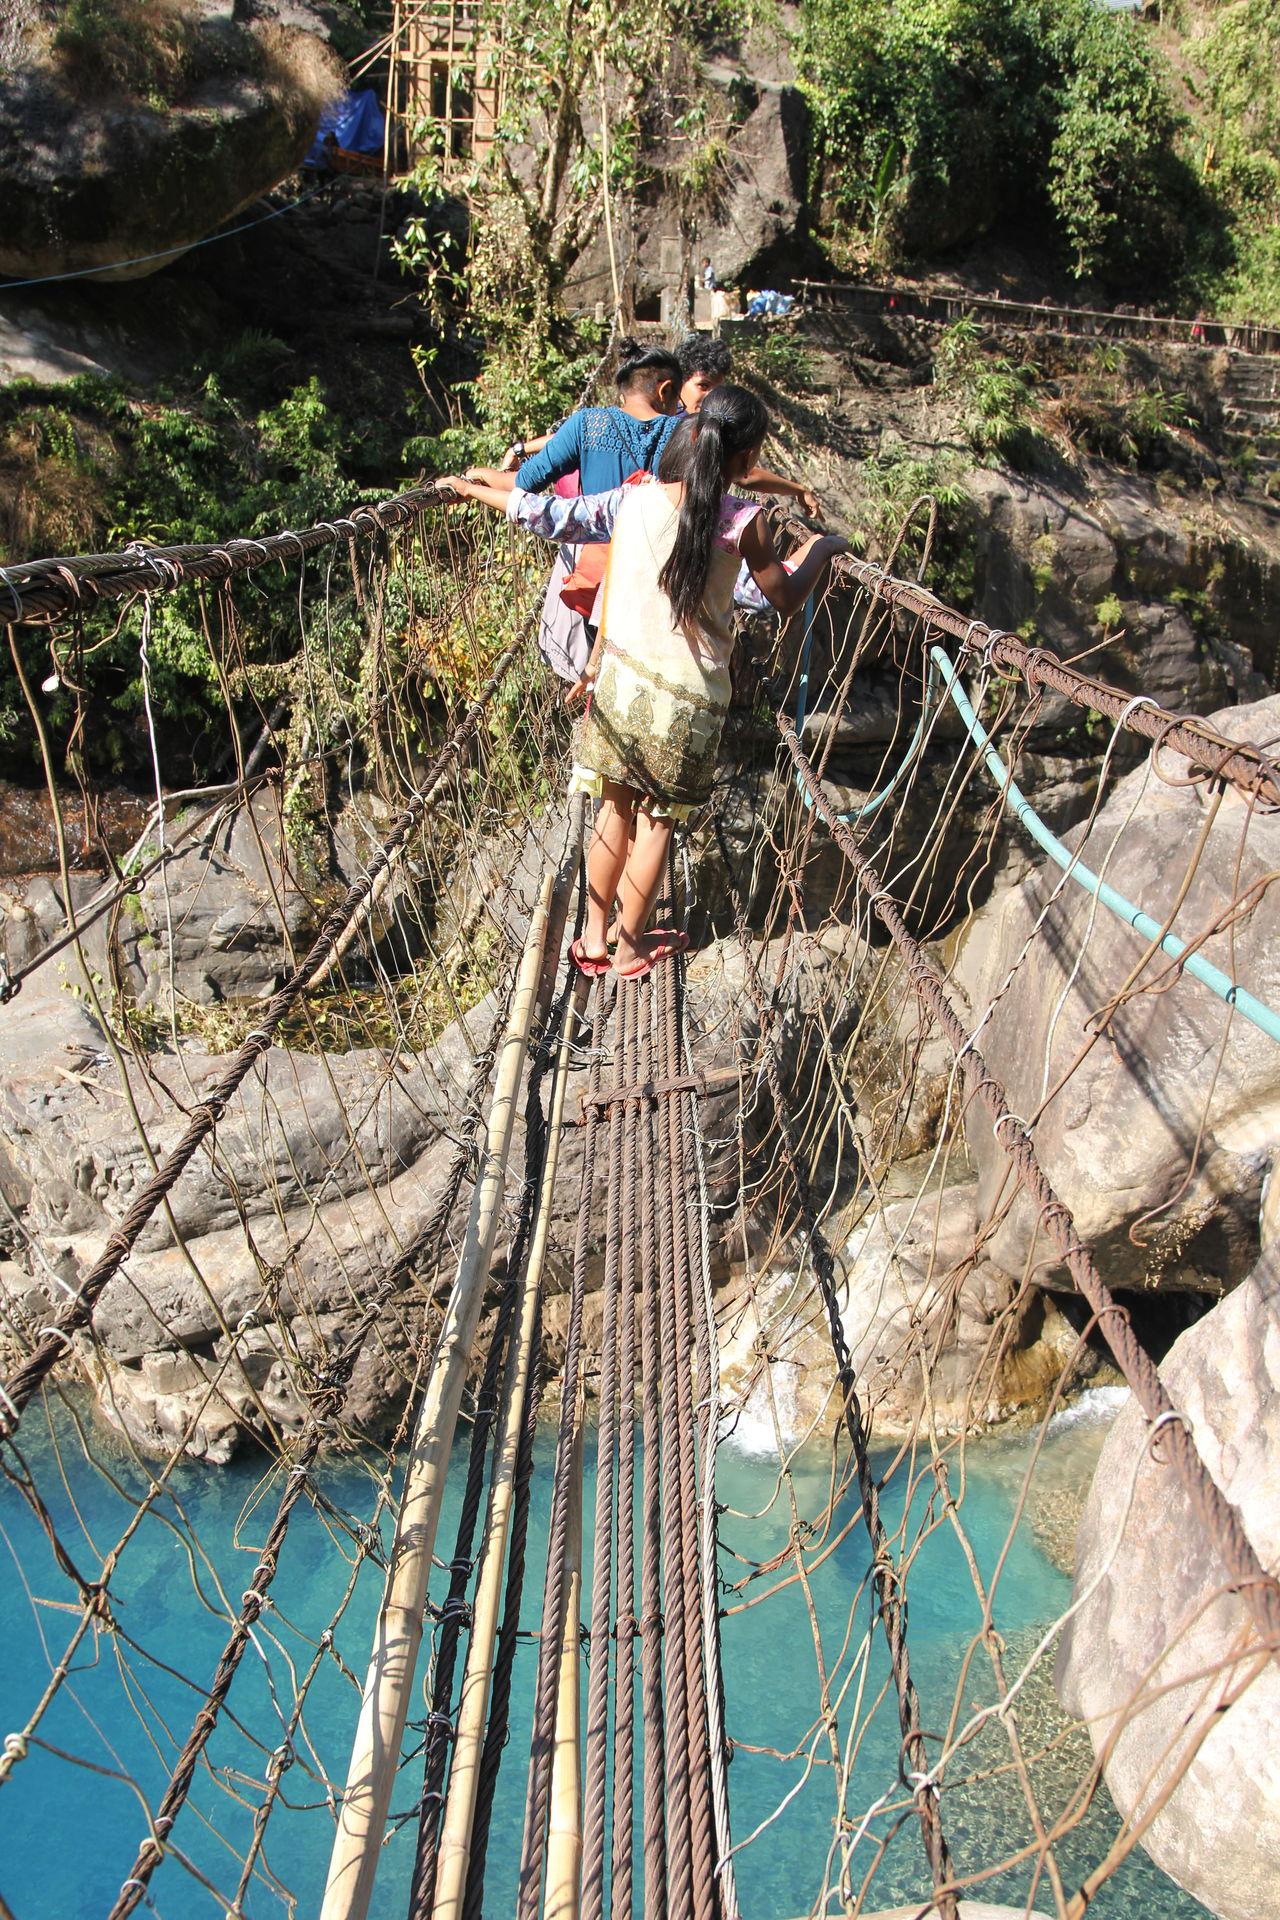 #dailycommute #khasipeople #meghalaya #nongriat Metalbridges Outdoors Real People Transportation